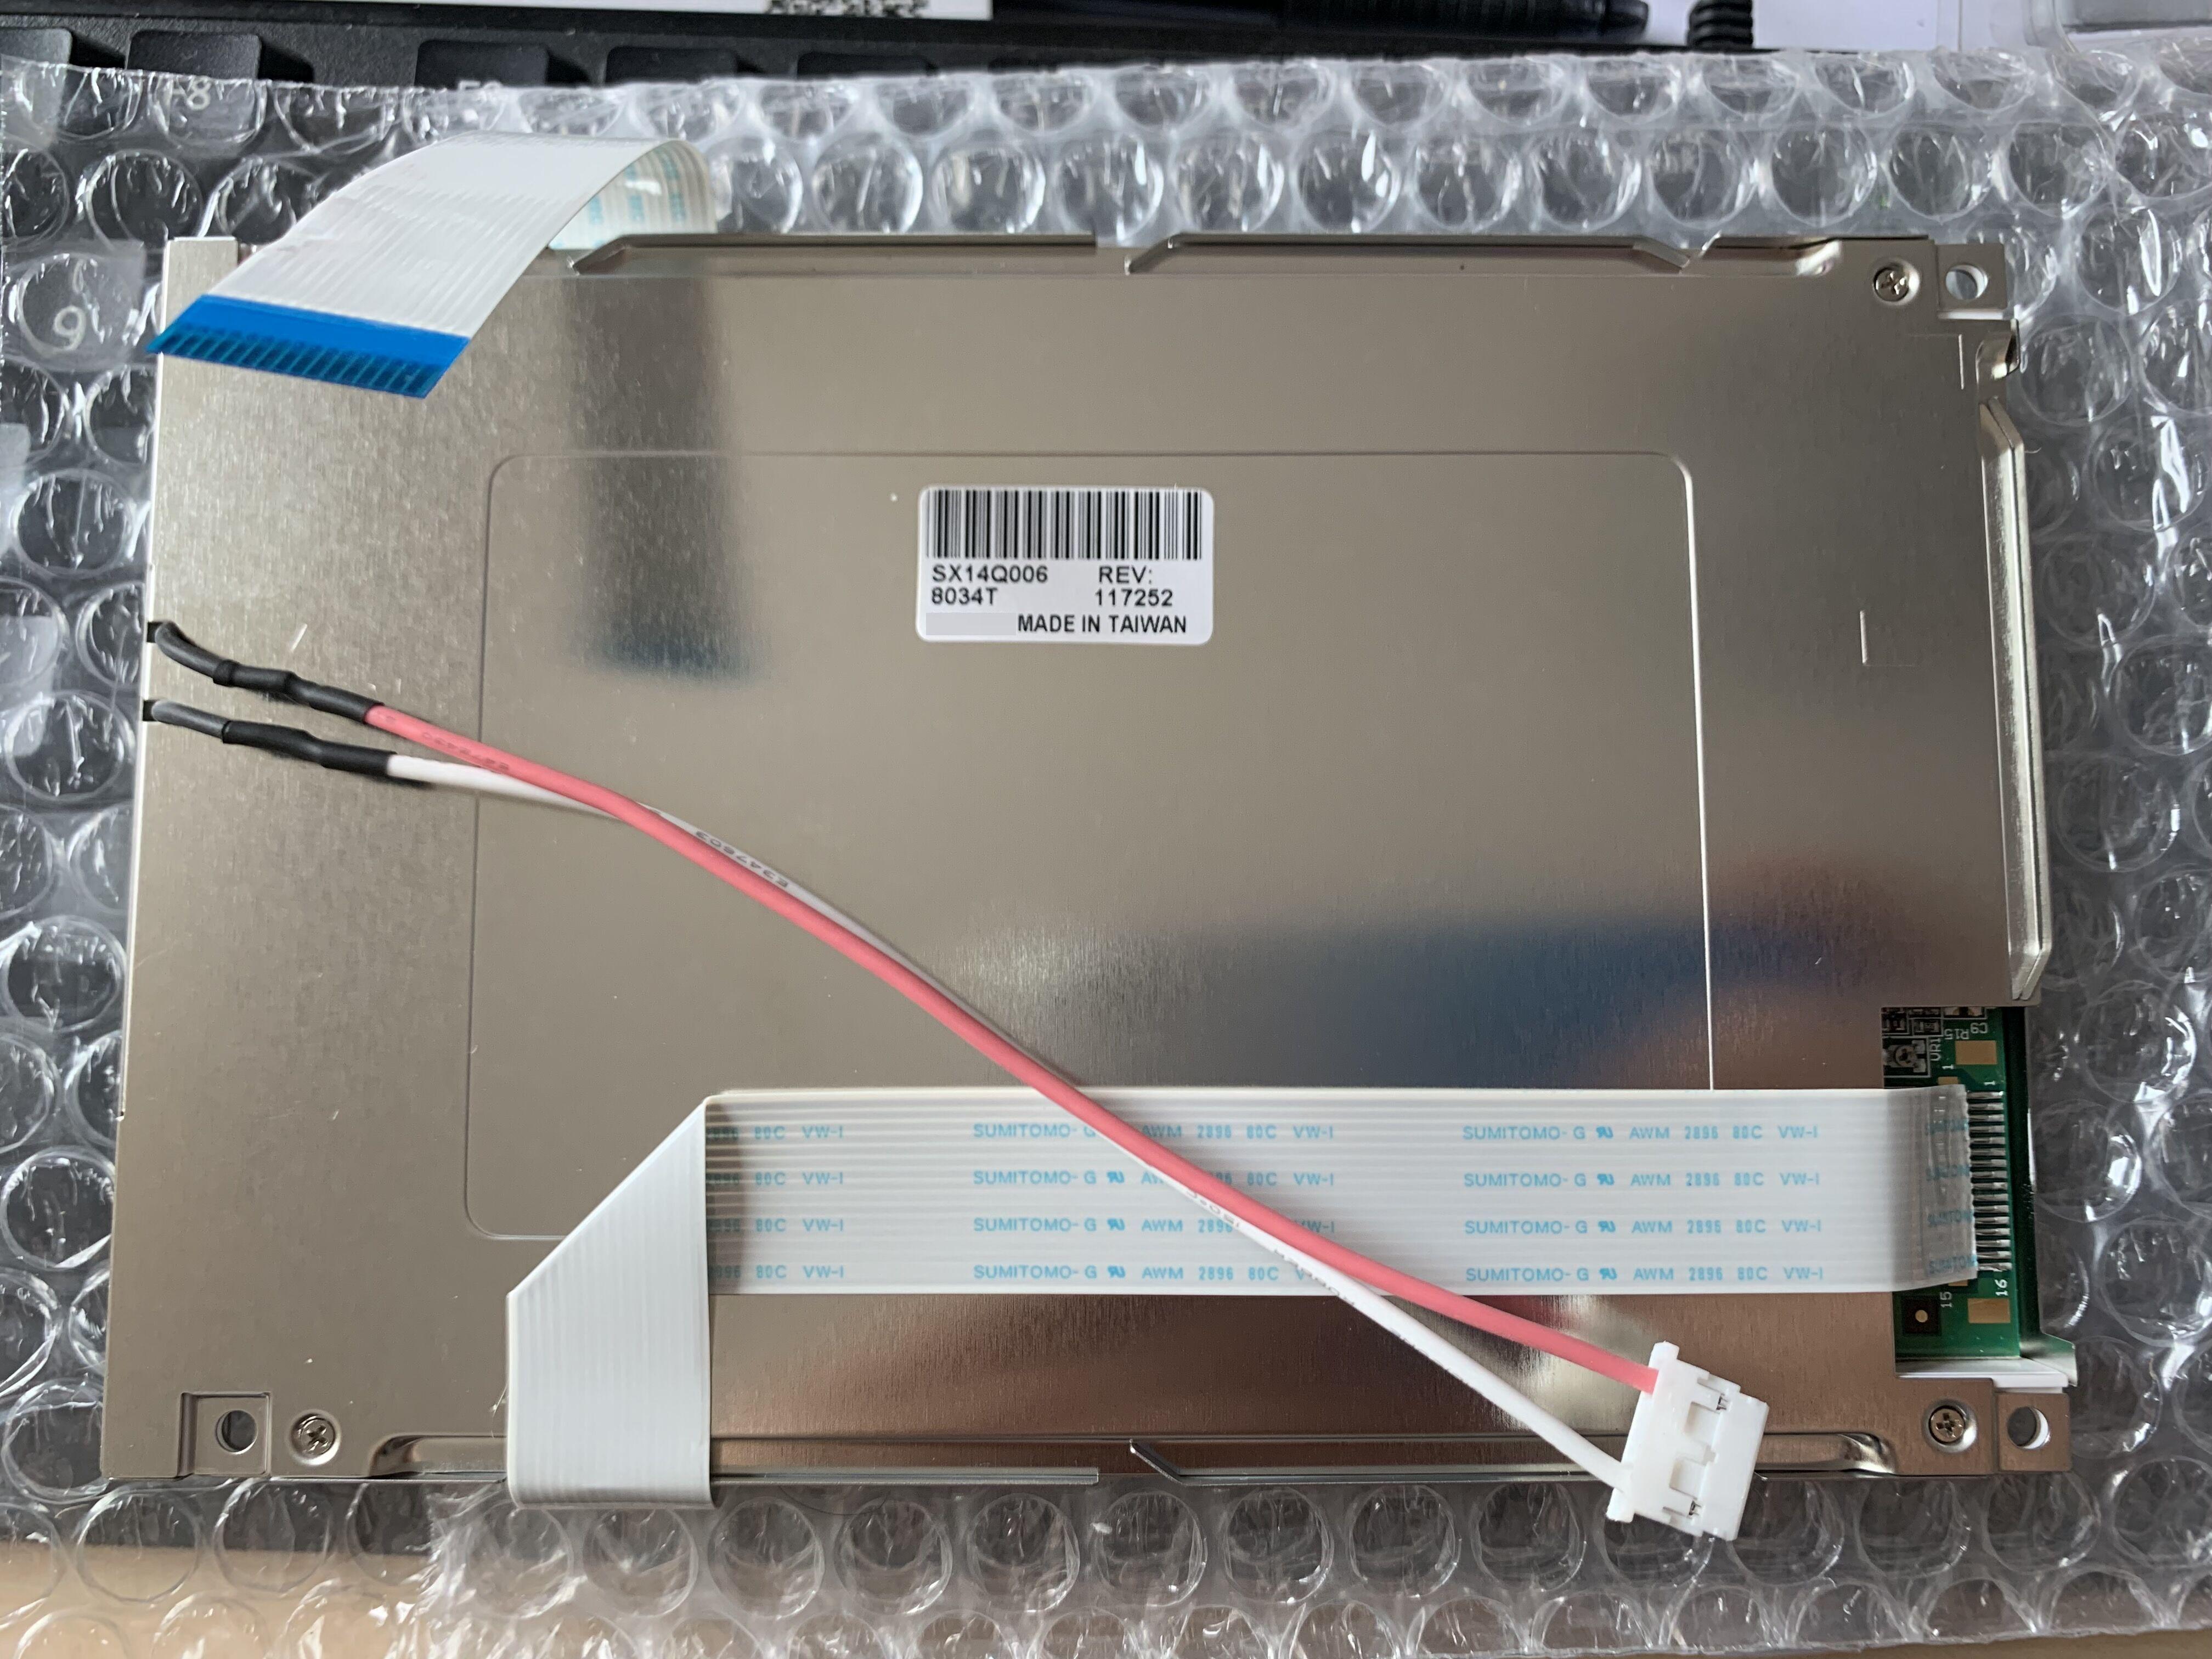 1 Pcs NEW HITACHI SX14Q006 5.7 inch LCD screen display panel